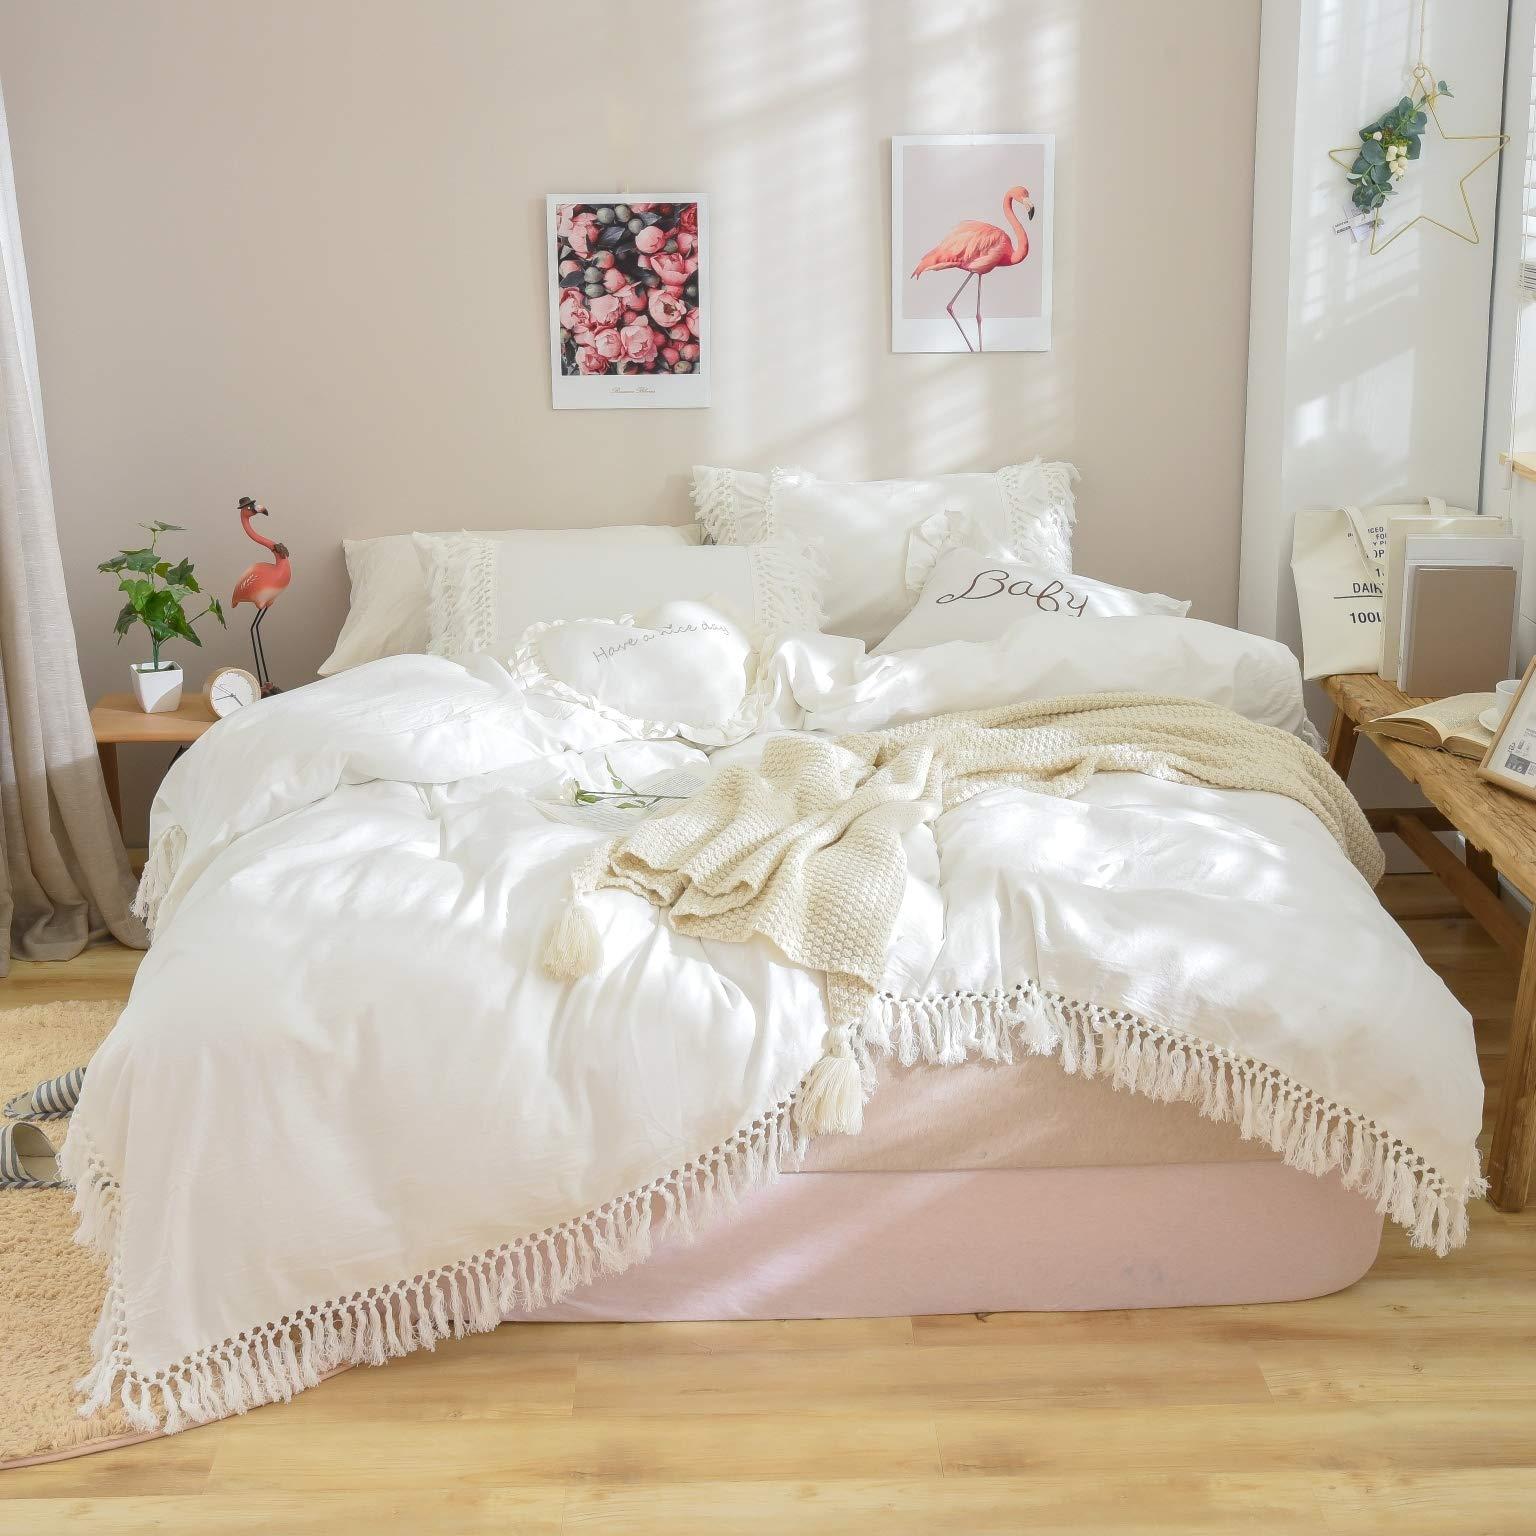 Softta Luxury and Elegant White Bedding Twin XL 3 Pcs Tassel Bohemian Duvet Cover 100% Washed Cotton